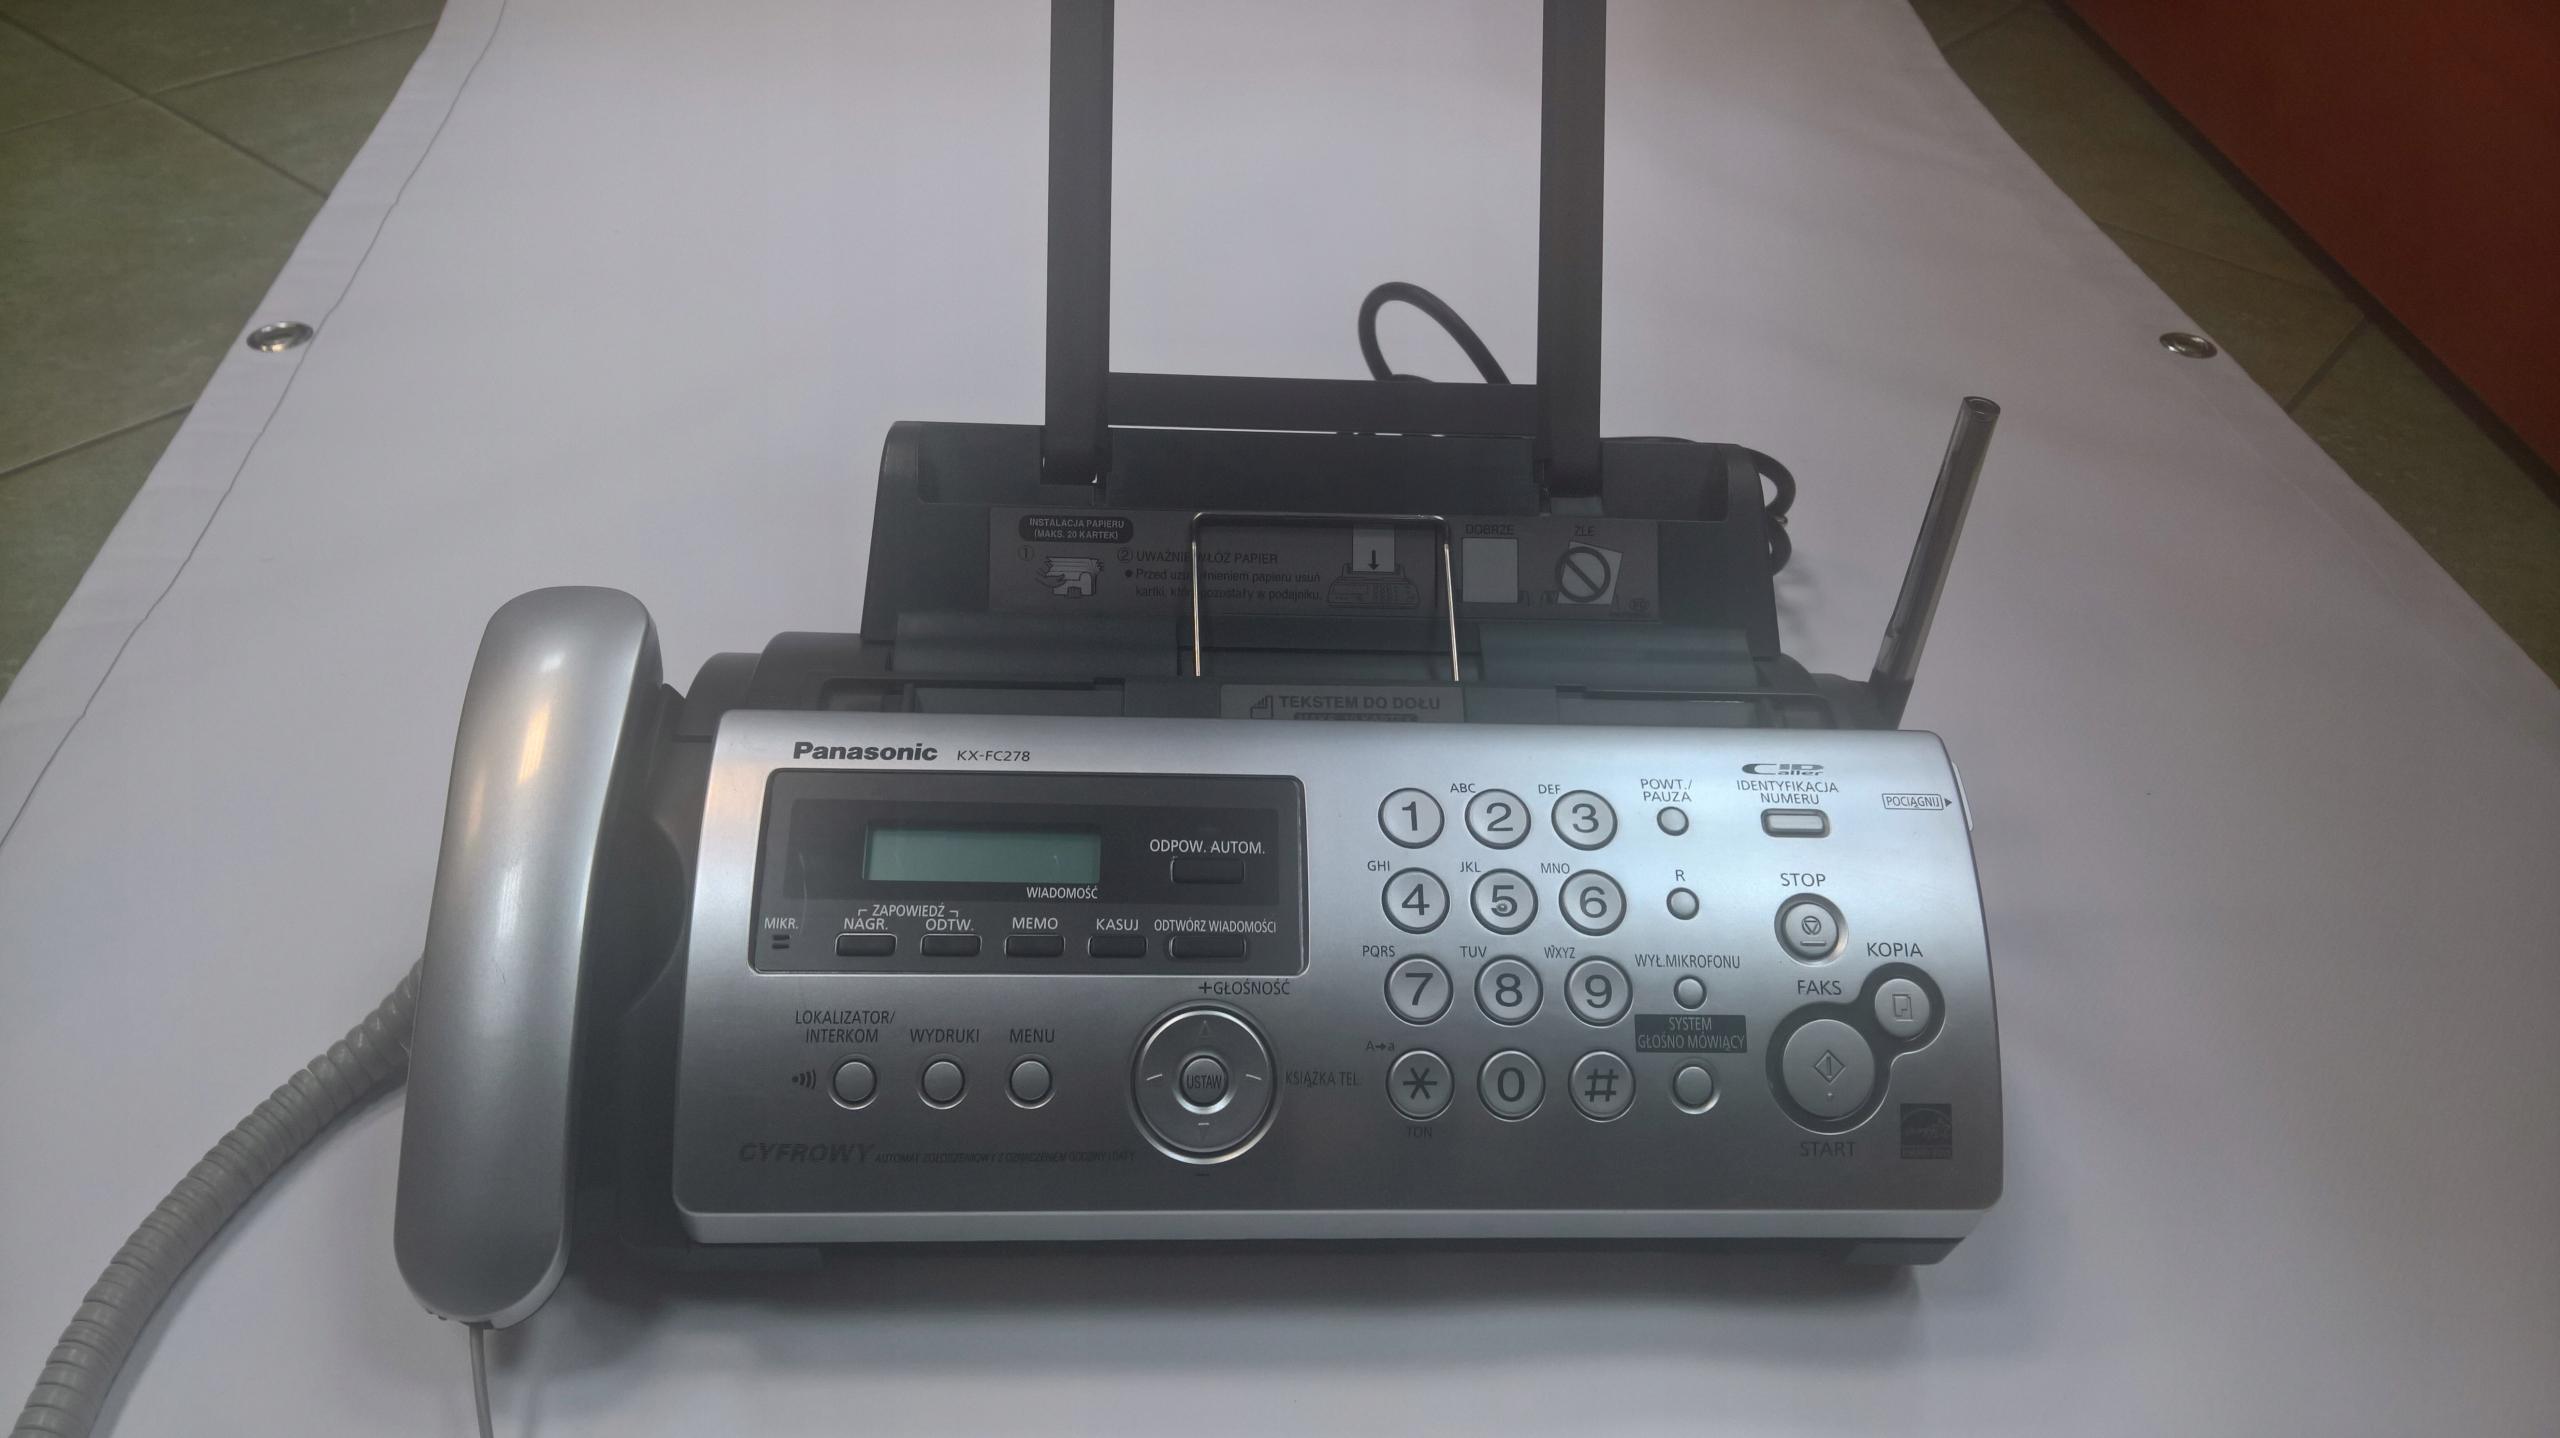 Fax Panasonic KX-FC278